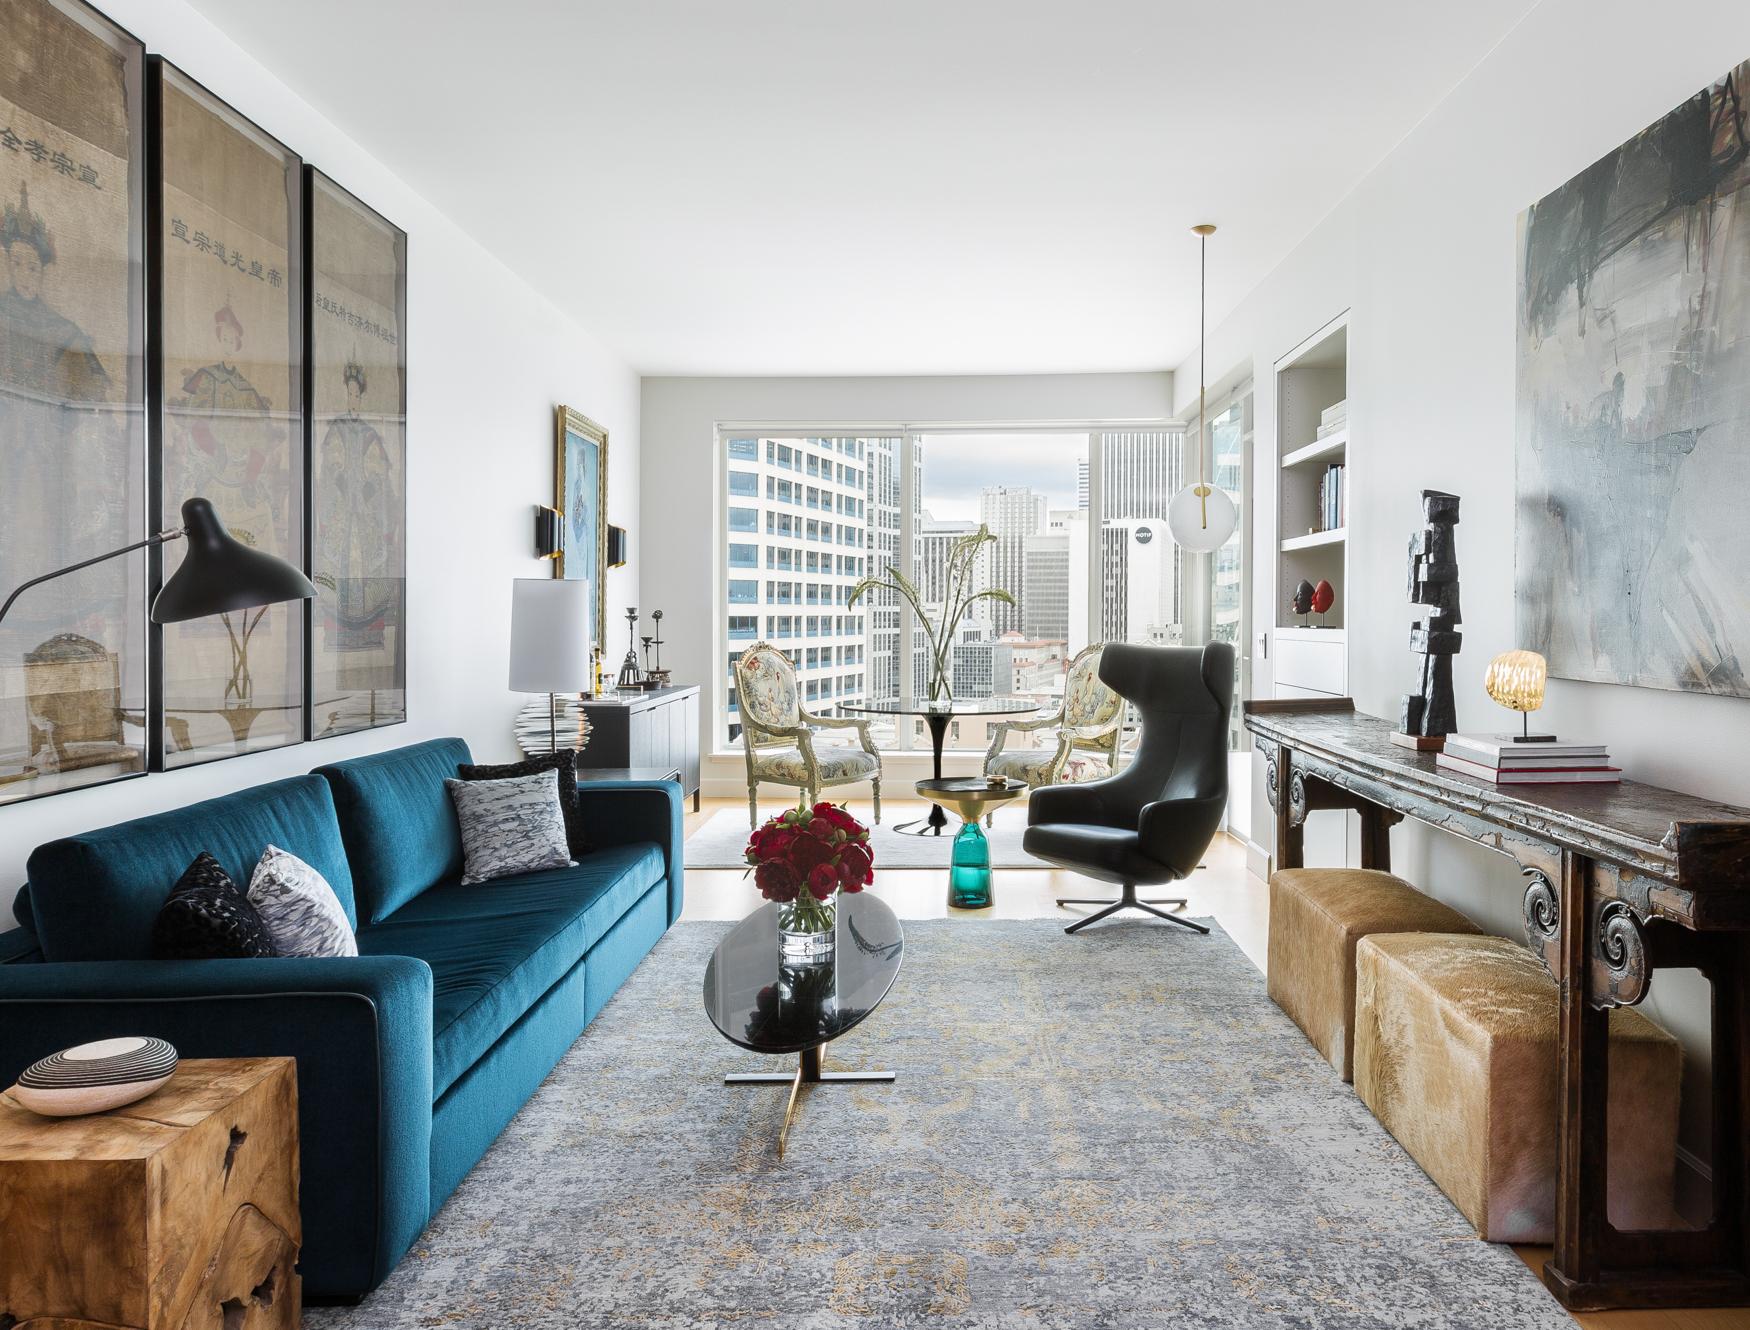 Michelle_Dirkse_Interior_Design_&_Home_Decor.jpg